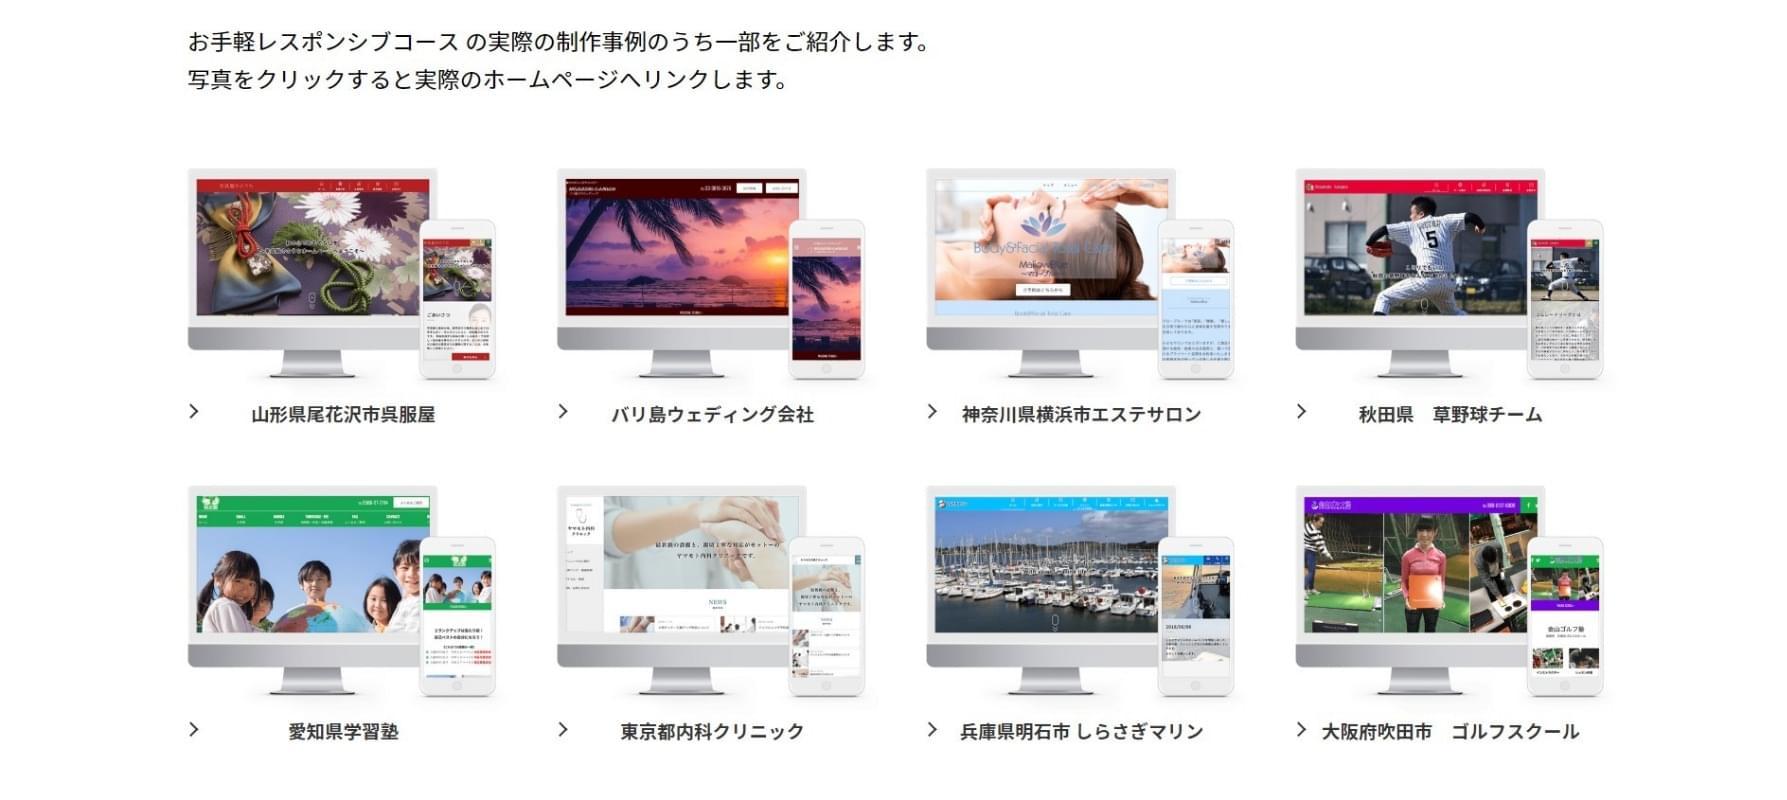 CHACO-WEB.COM製作実績